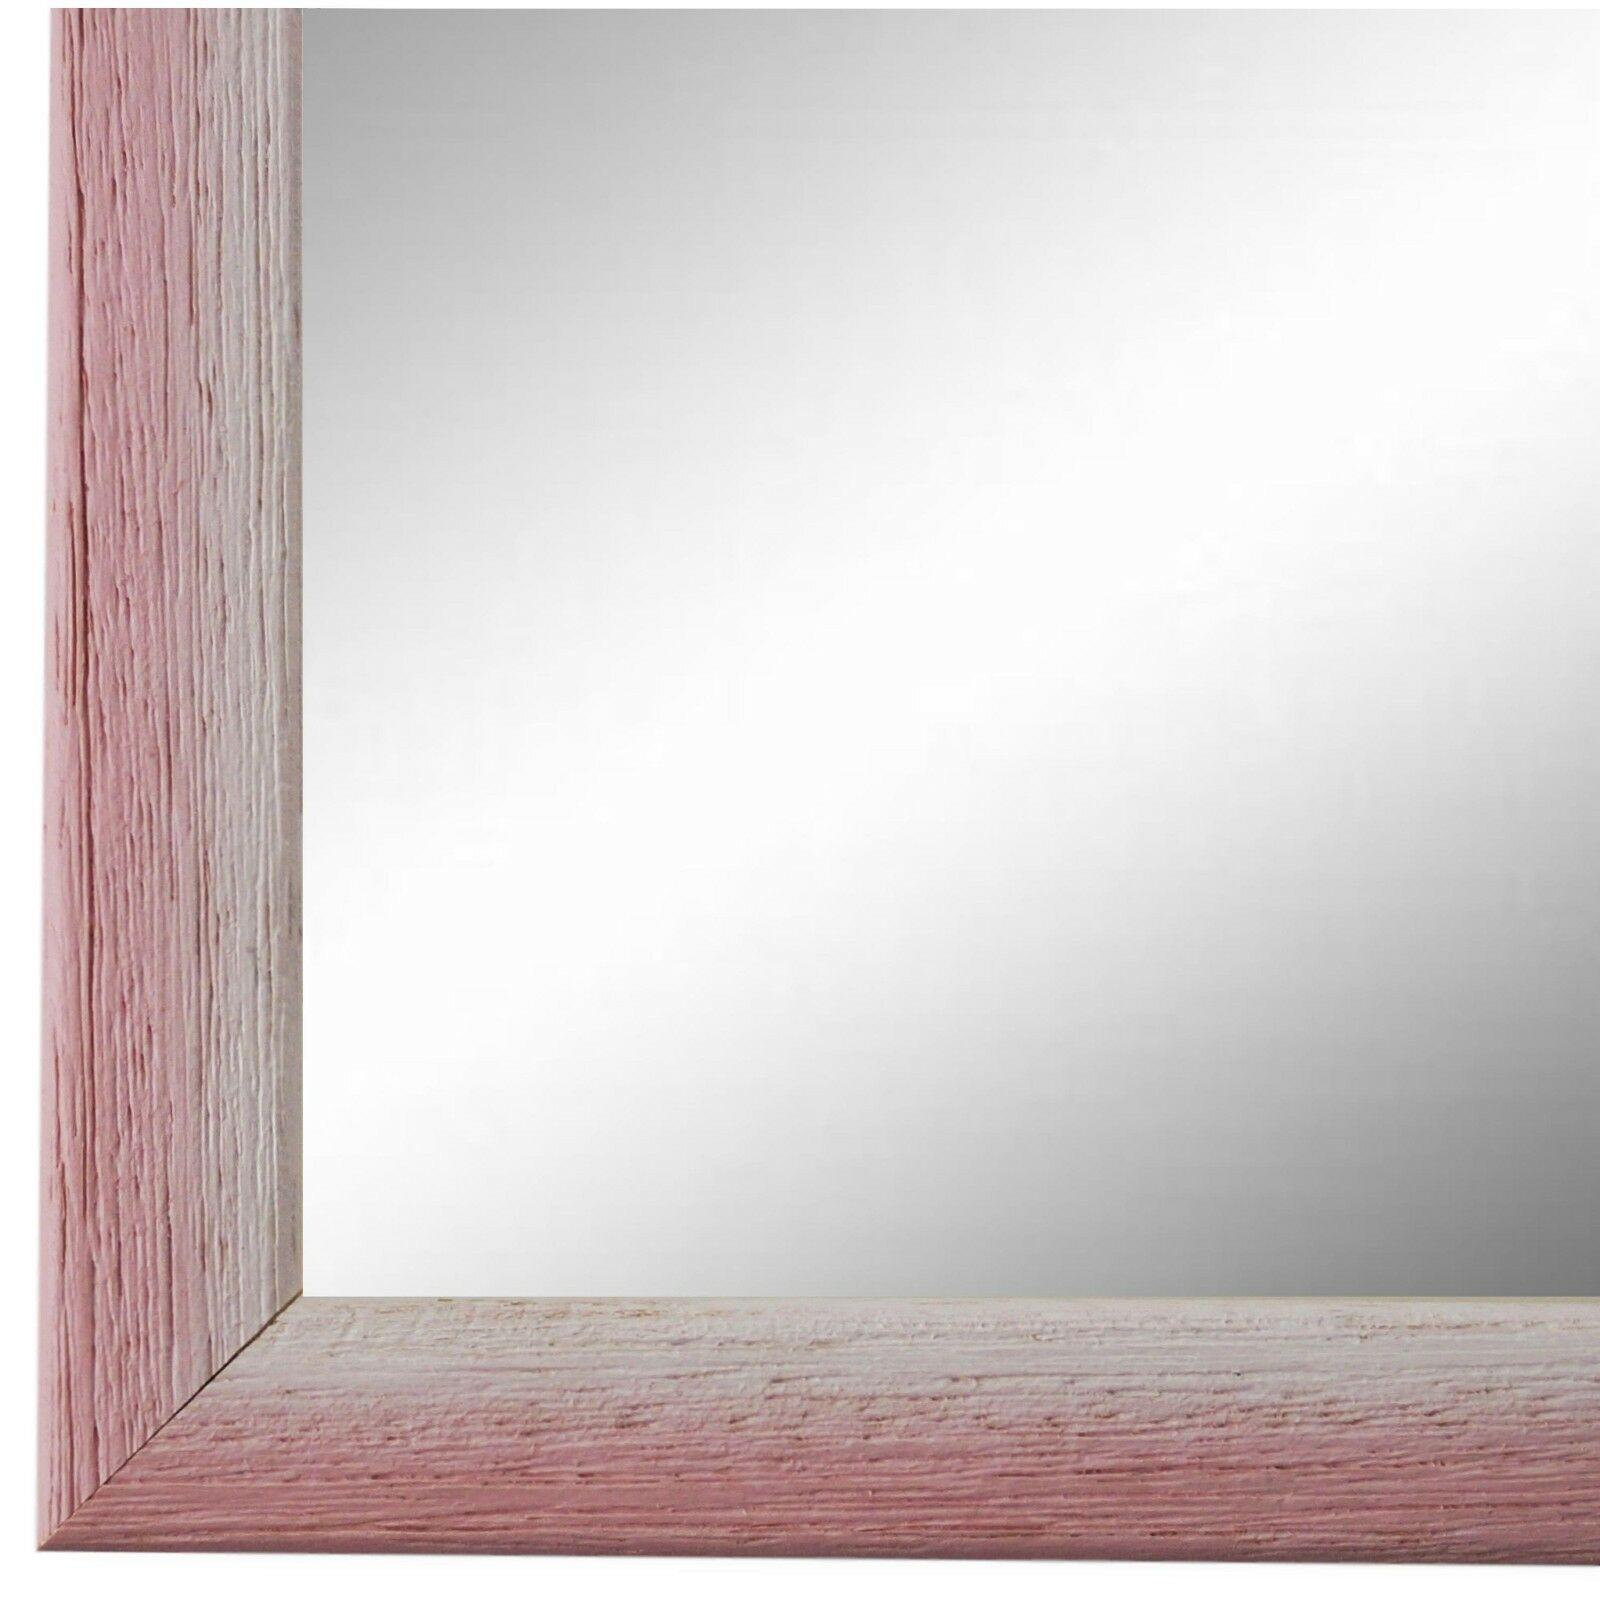 Wandspiegel Spiegel Rosa Weiss Retro Vintage Holz Pinerolo 2, 3 ...